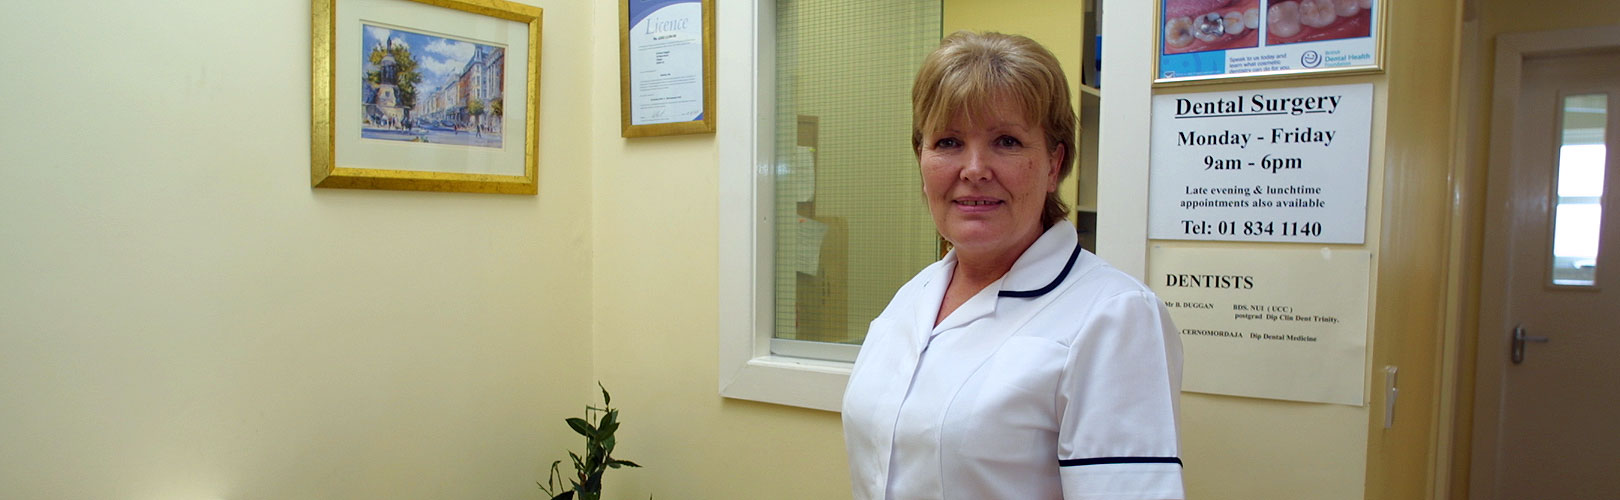 ann-receptionist-bryan-duggan-dentist_1852-1620x500